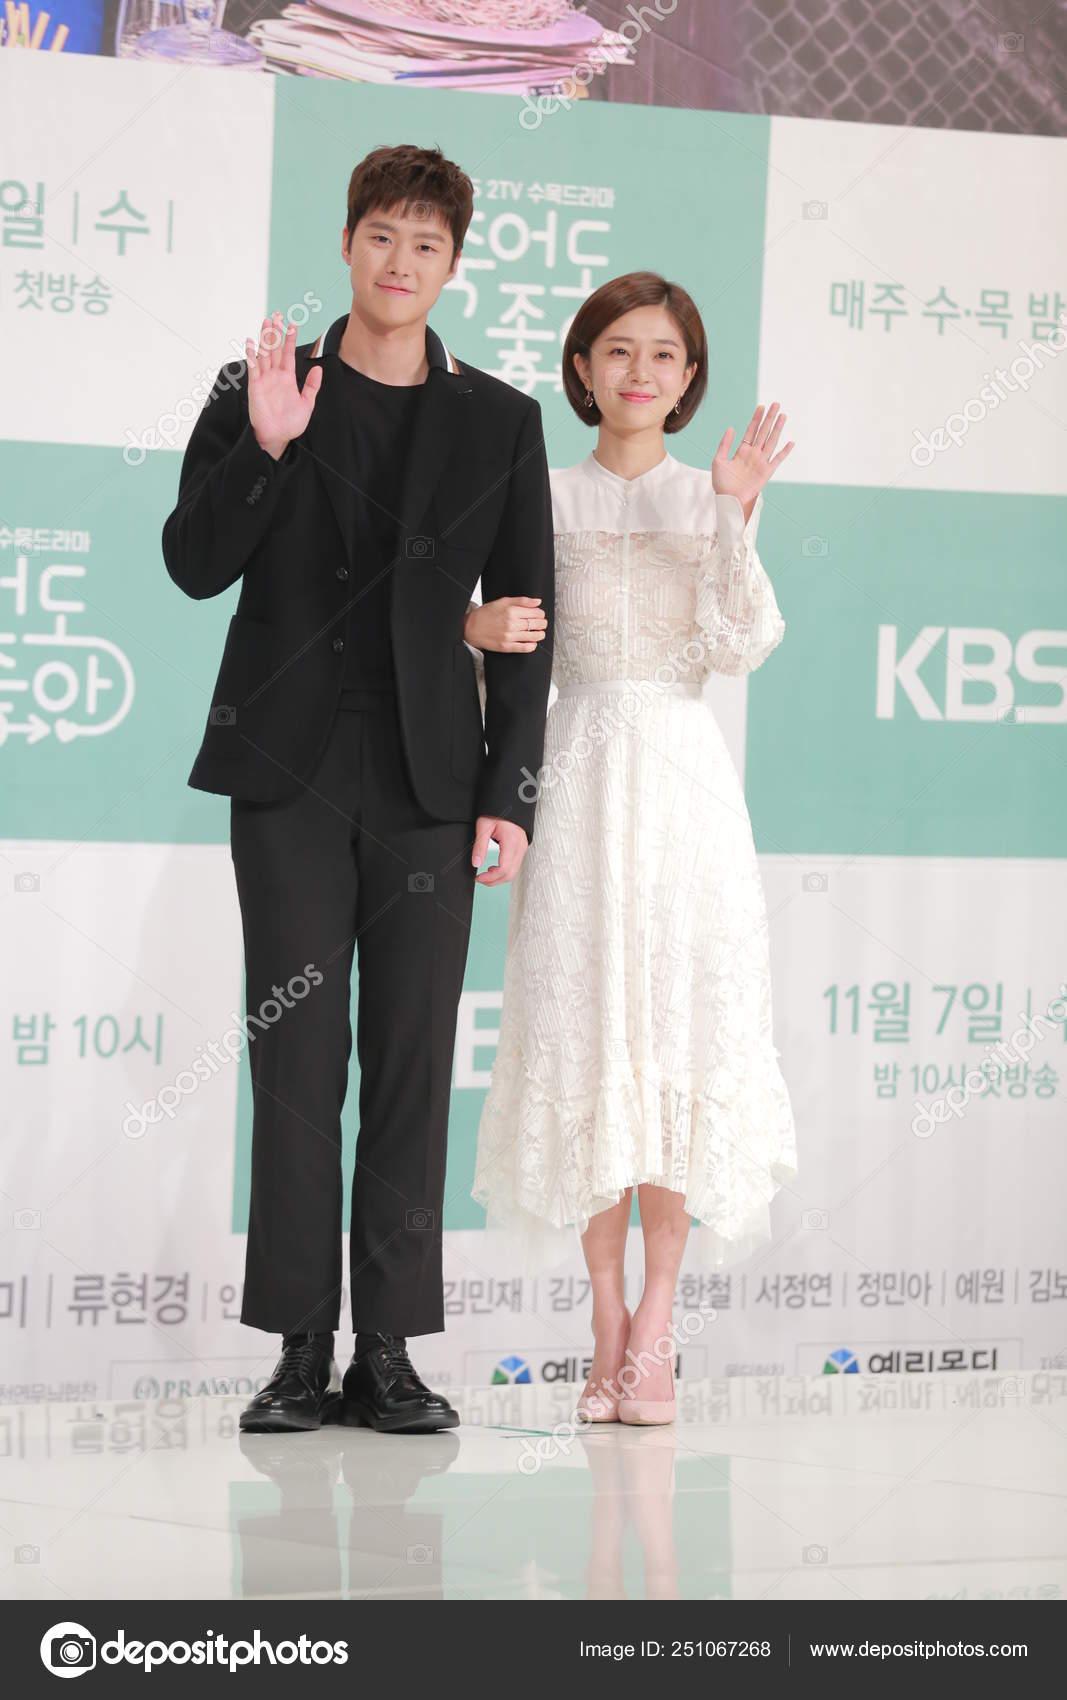 South Korean Actress Baek Jin Hee Right Actor Gong Myung